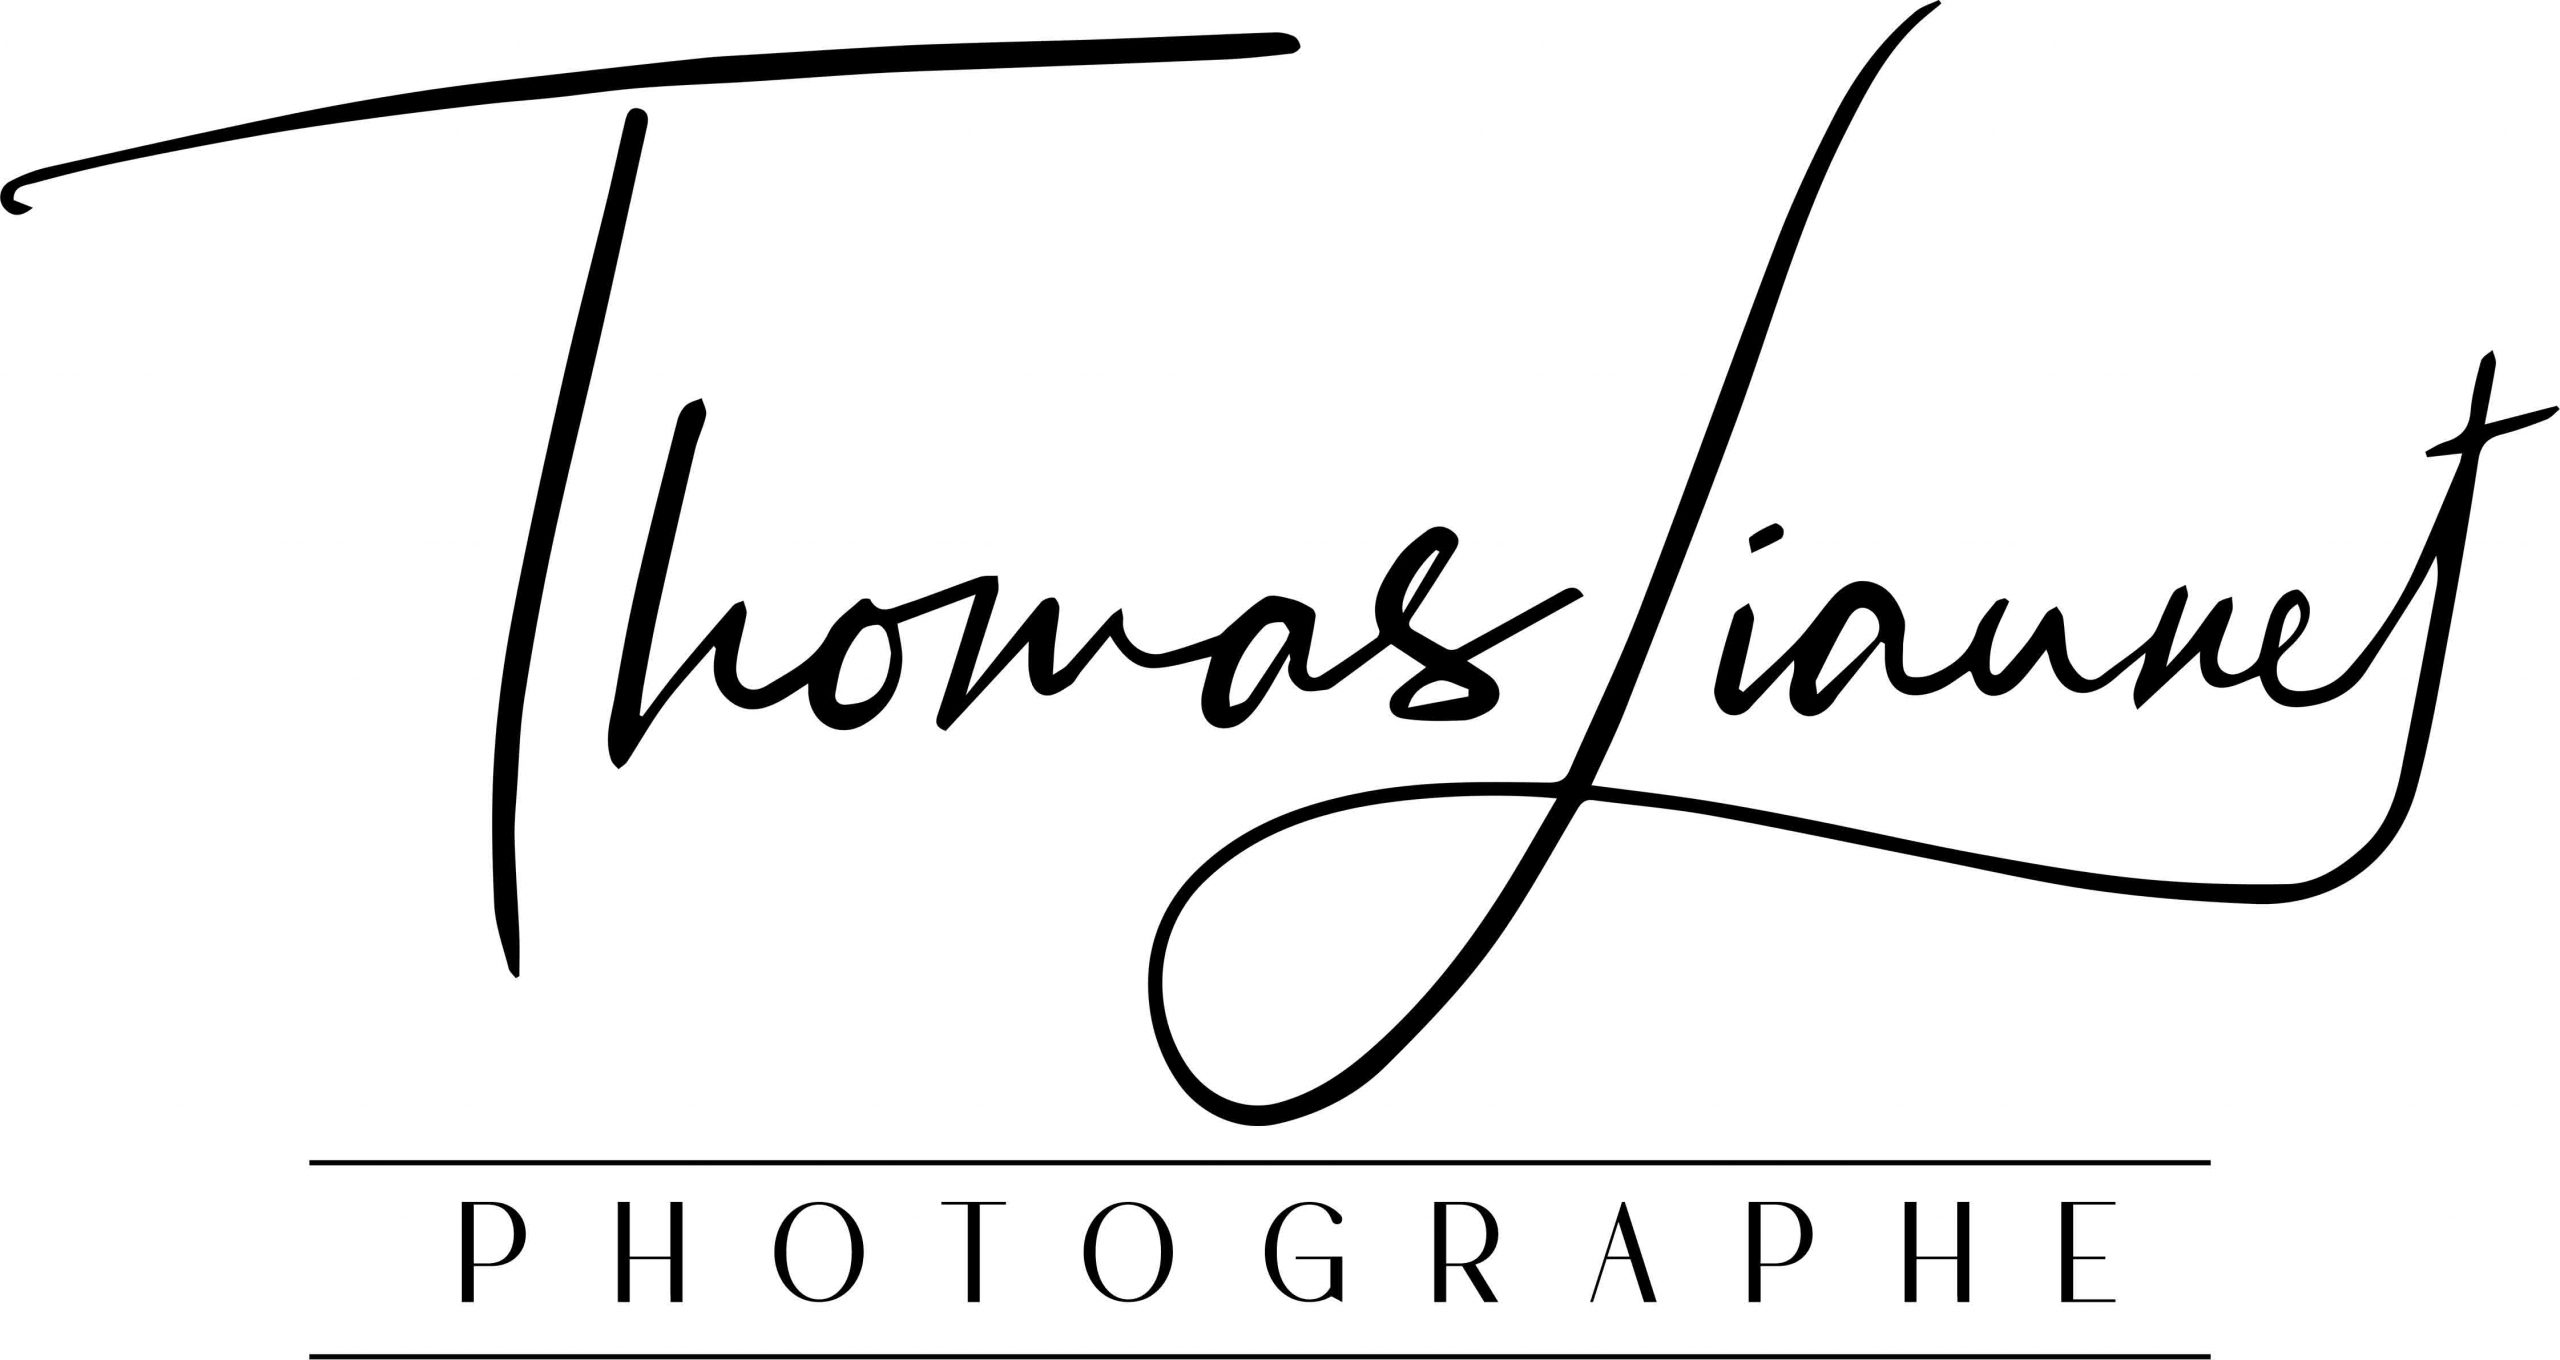 Thomas Liaunet | Photographe professionnel architecture | Landes